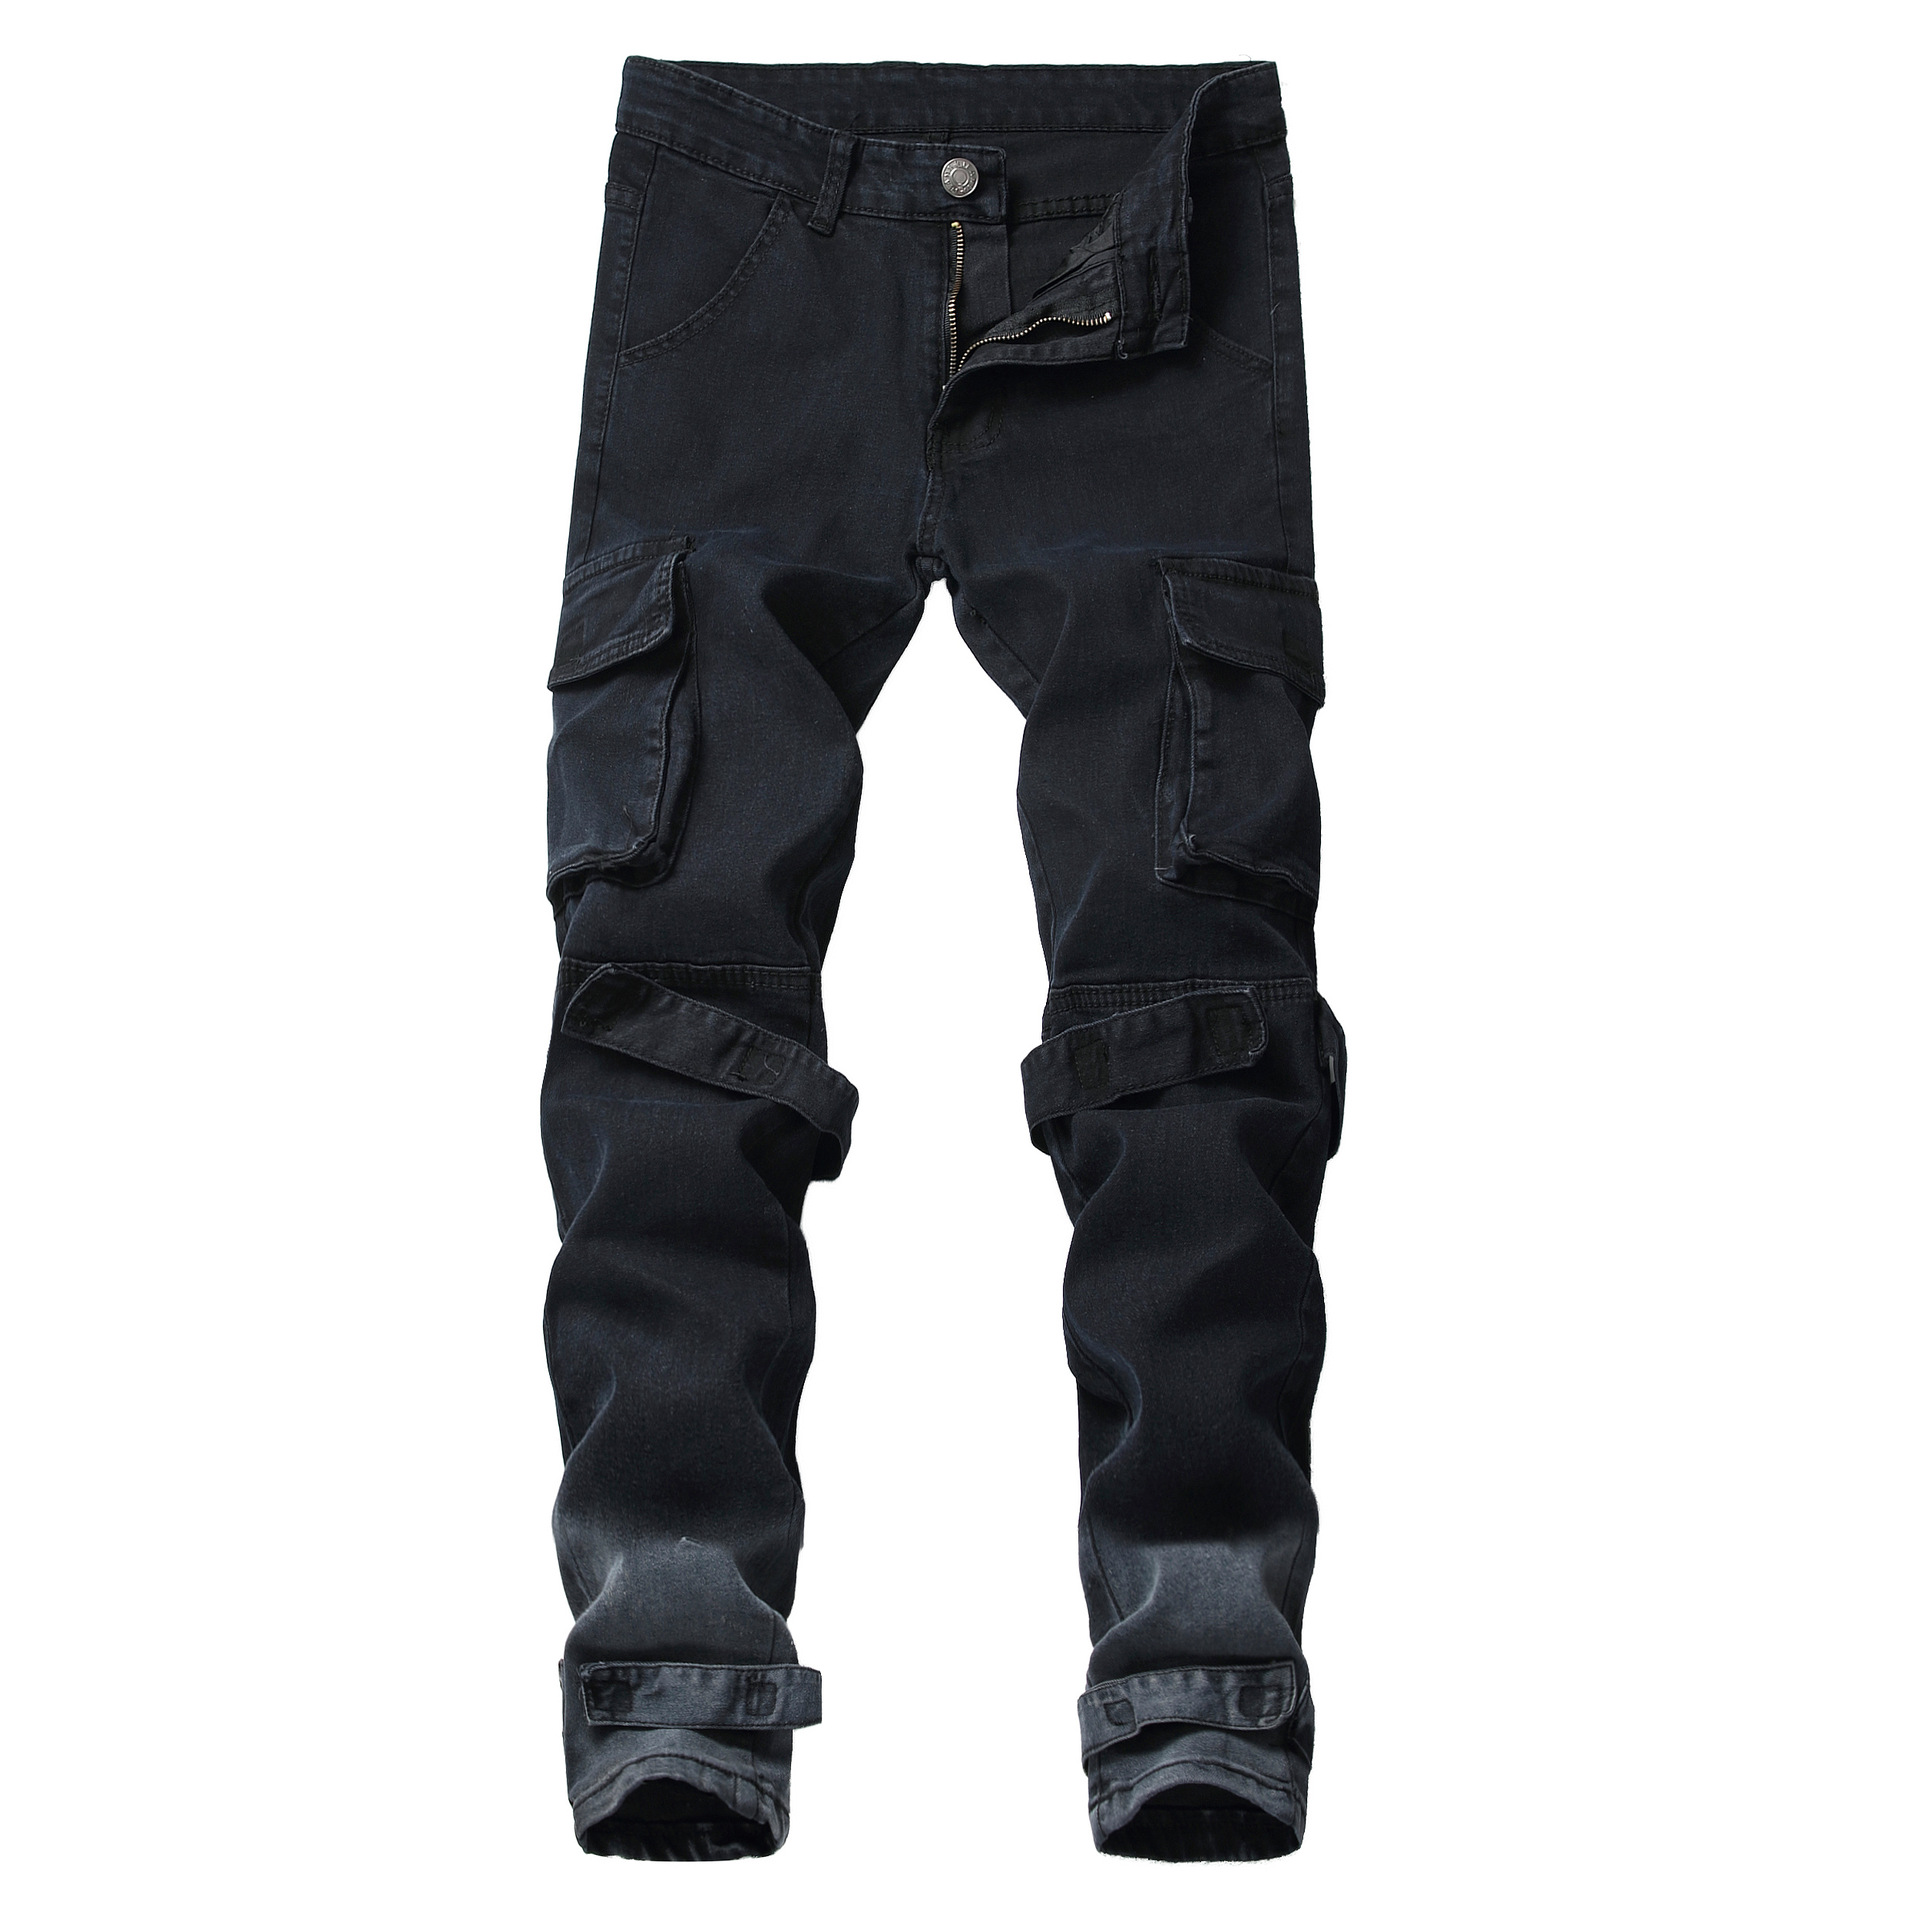 Men Fashion Jeans Casual  Big Pocket Pant High Street Hip Hop Slim Fit Streetwear Trousers Biker Black Harness Pant Plus Size